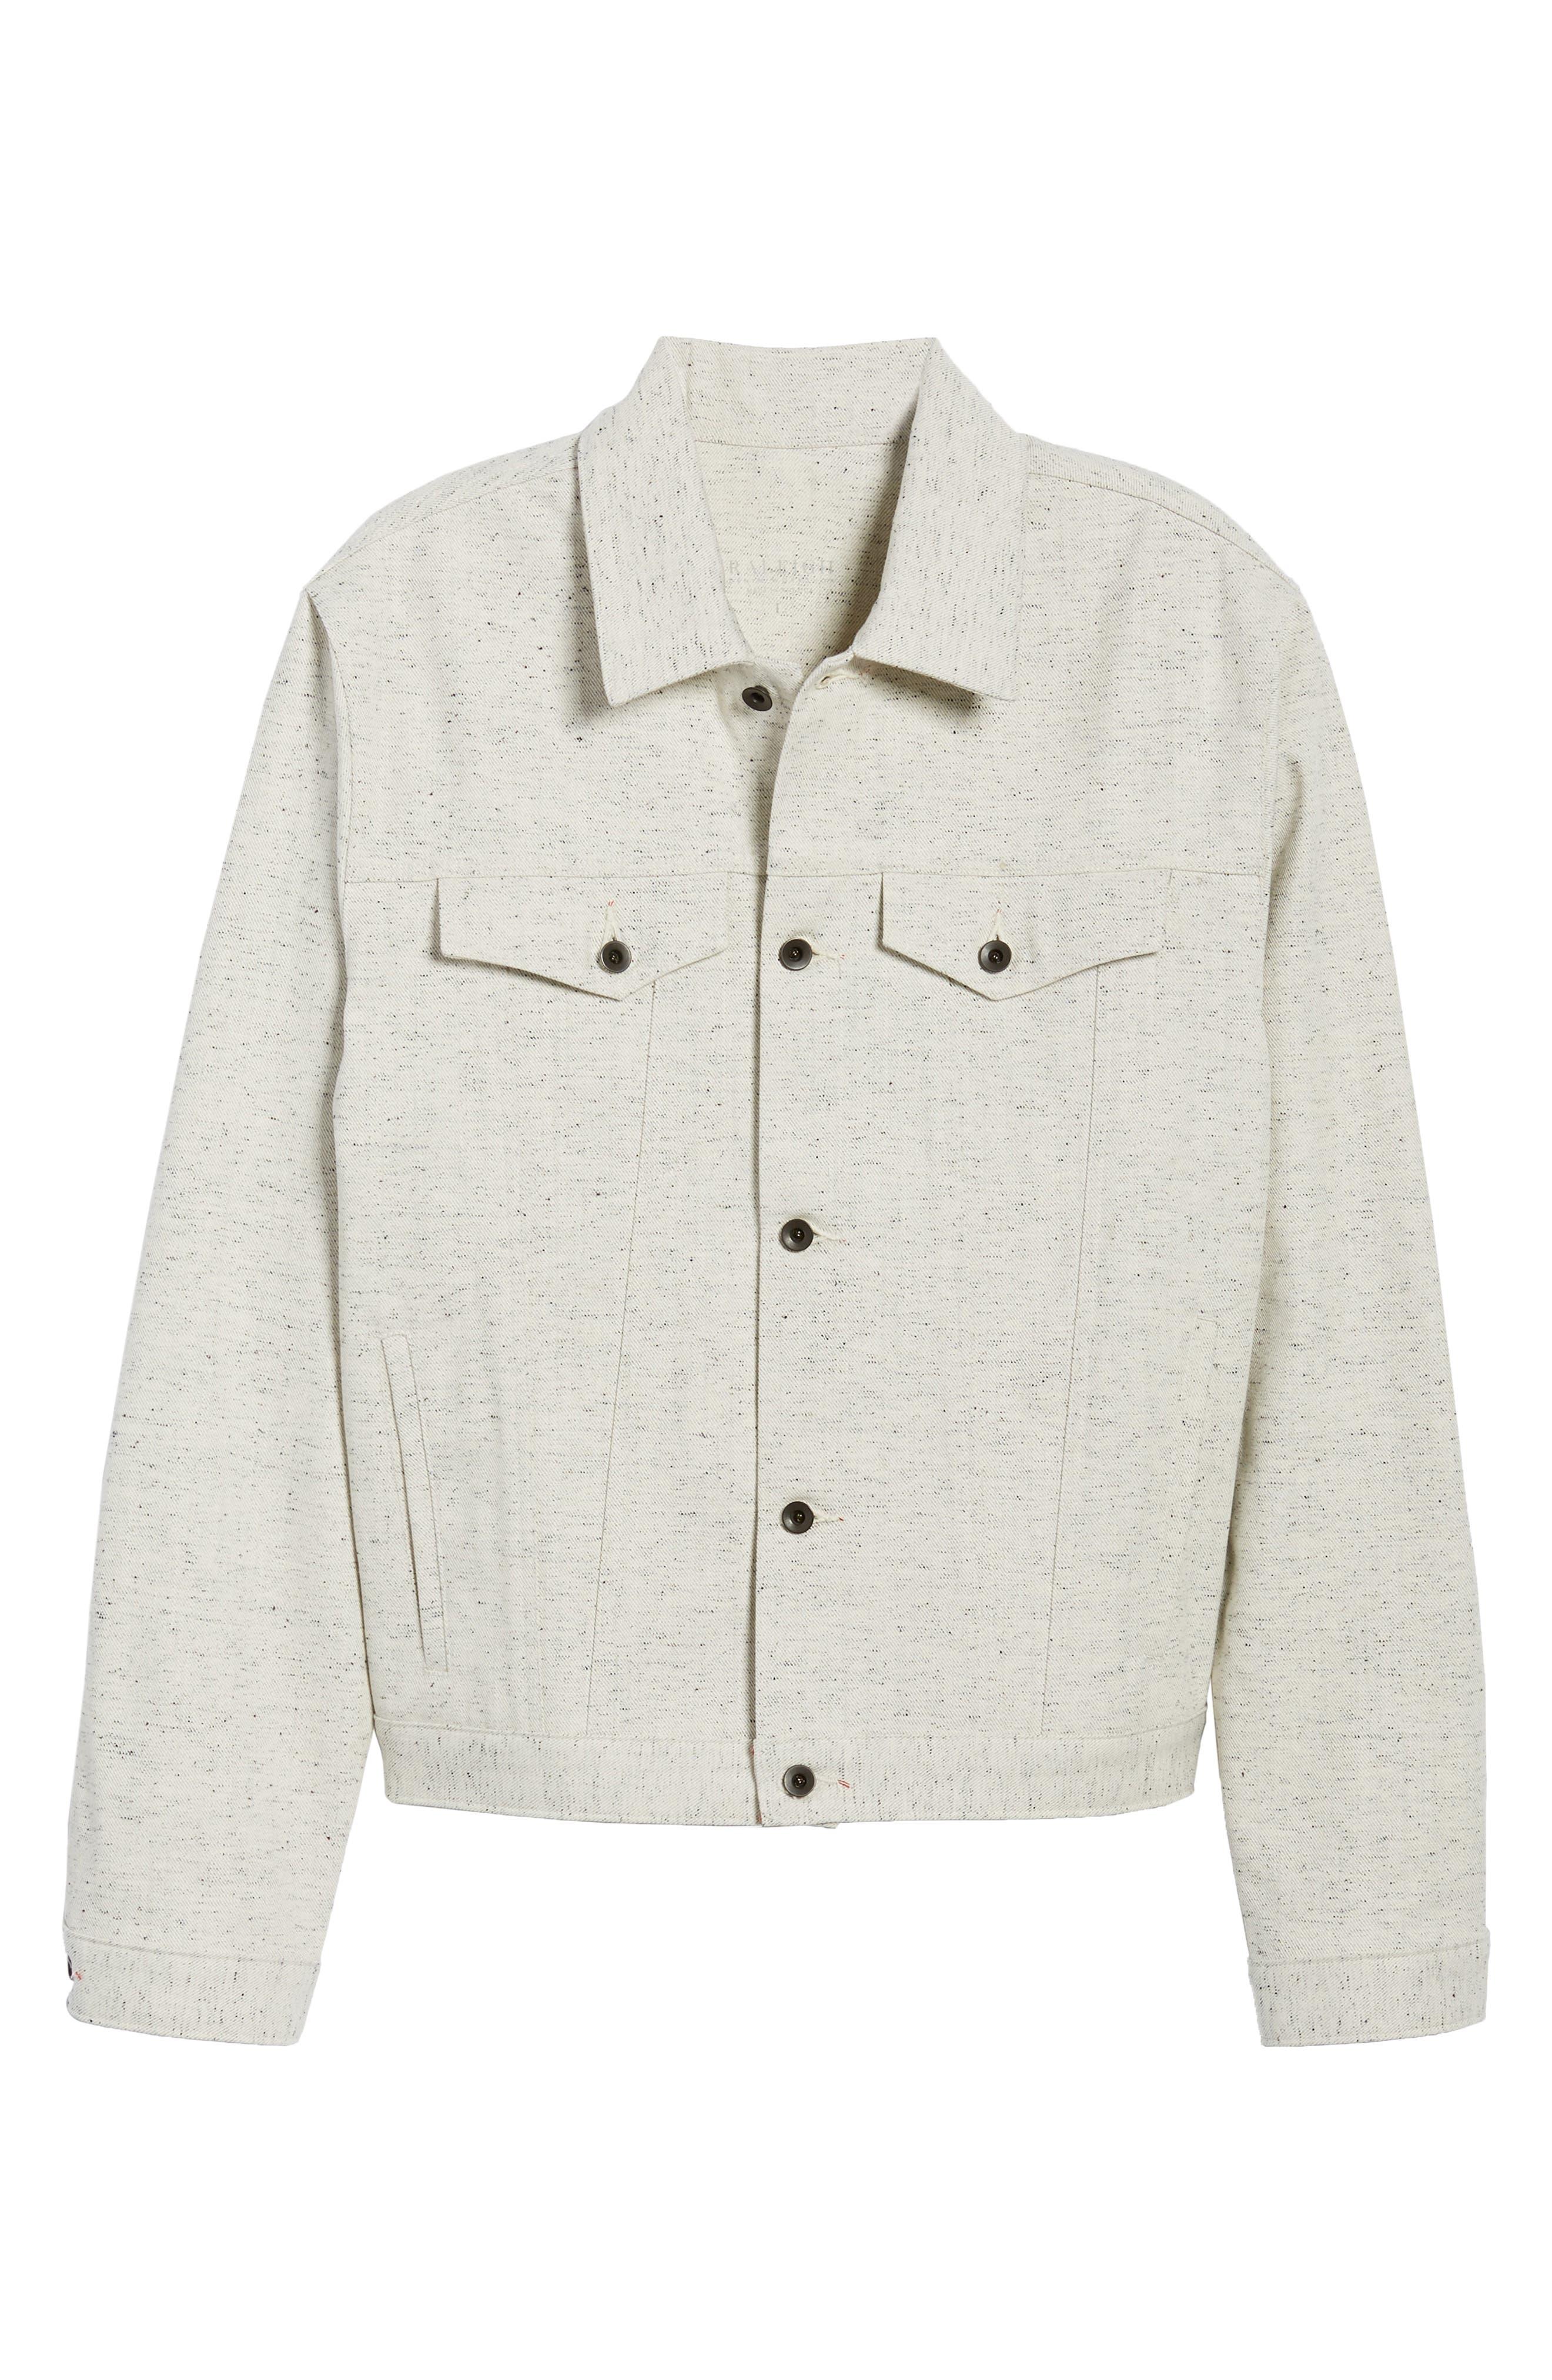 Natural Denim Jacket,                             Alternate thumbnail 5, color,                             123